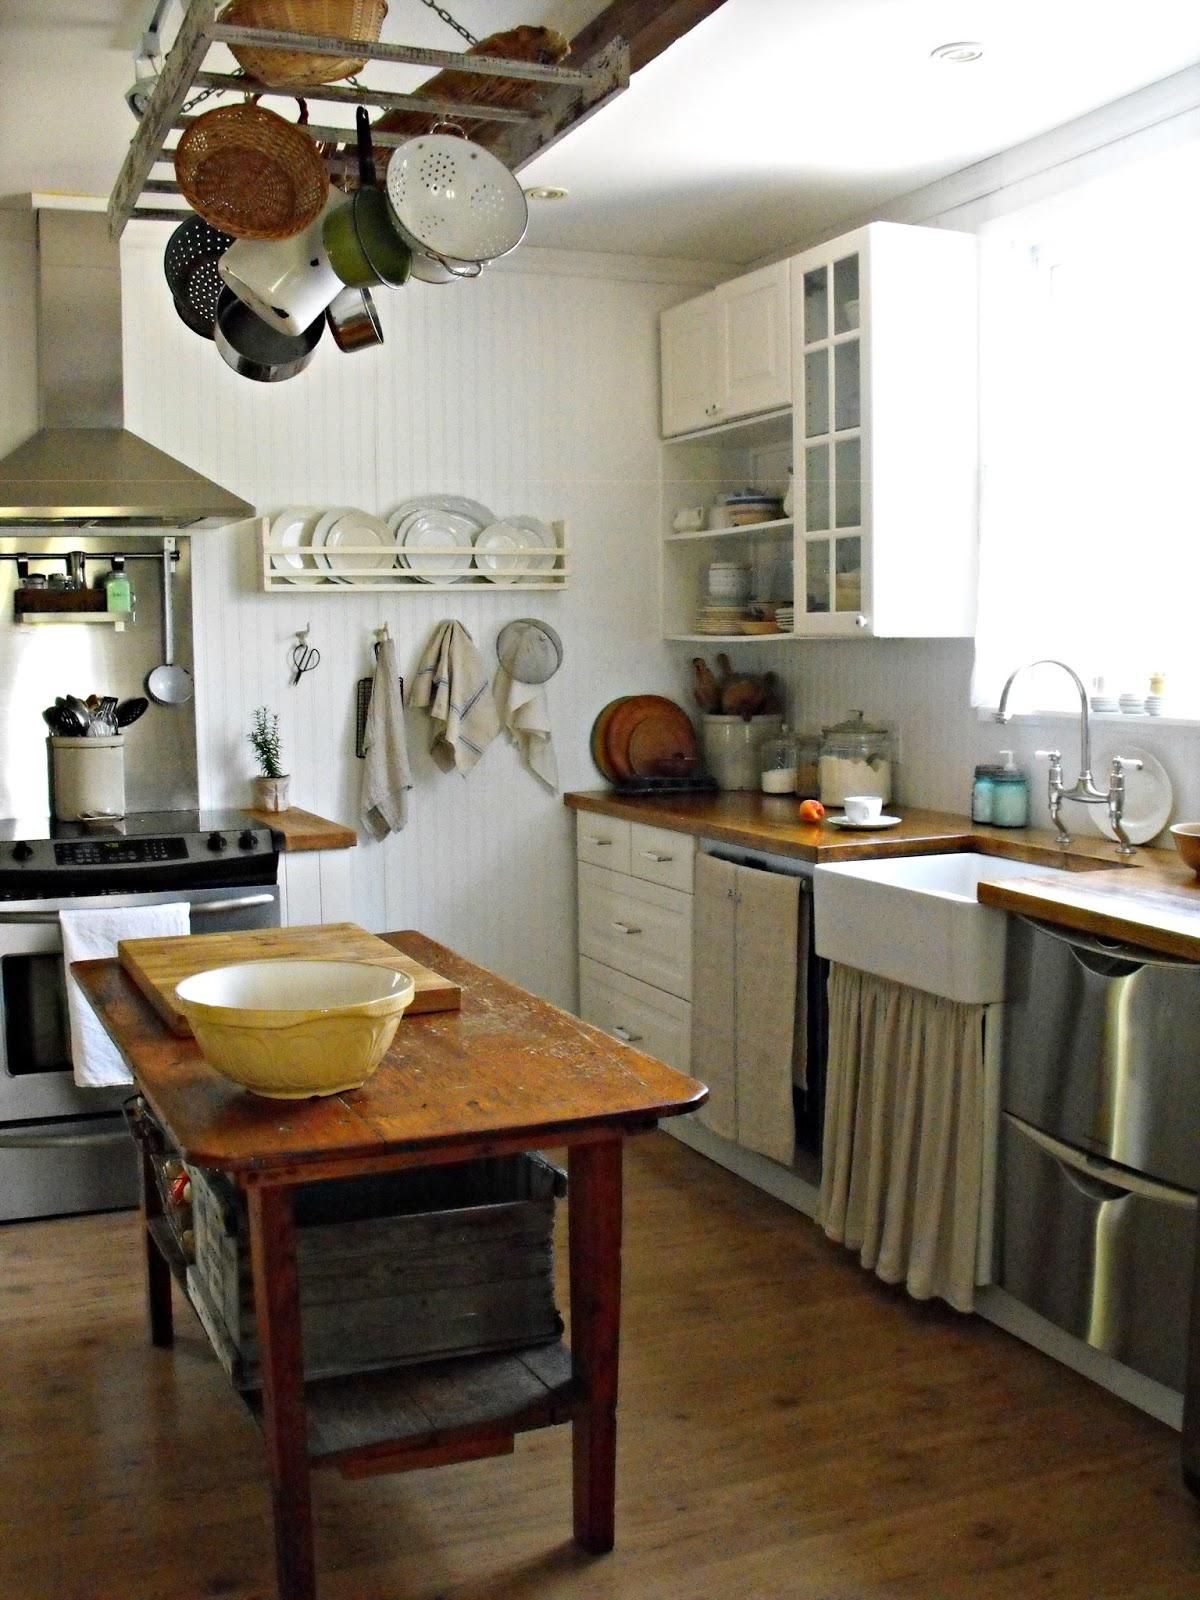 Rustic Farmhouse on Rustic Farmhouse Kitchen  id=63250